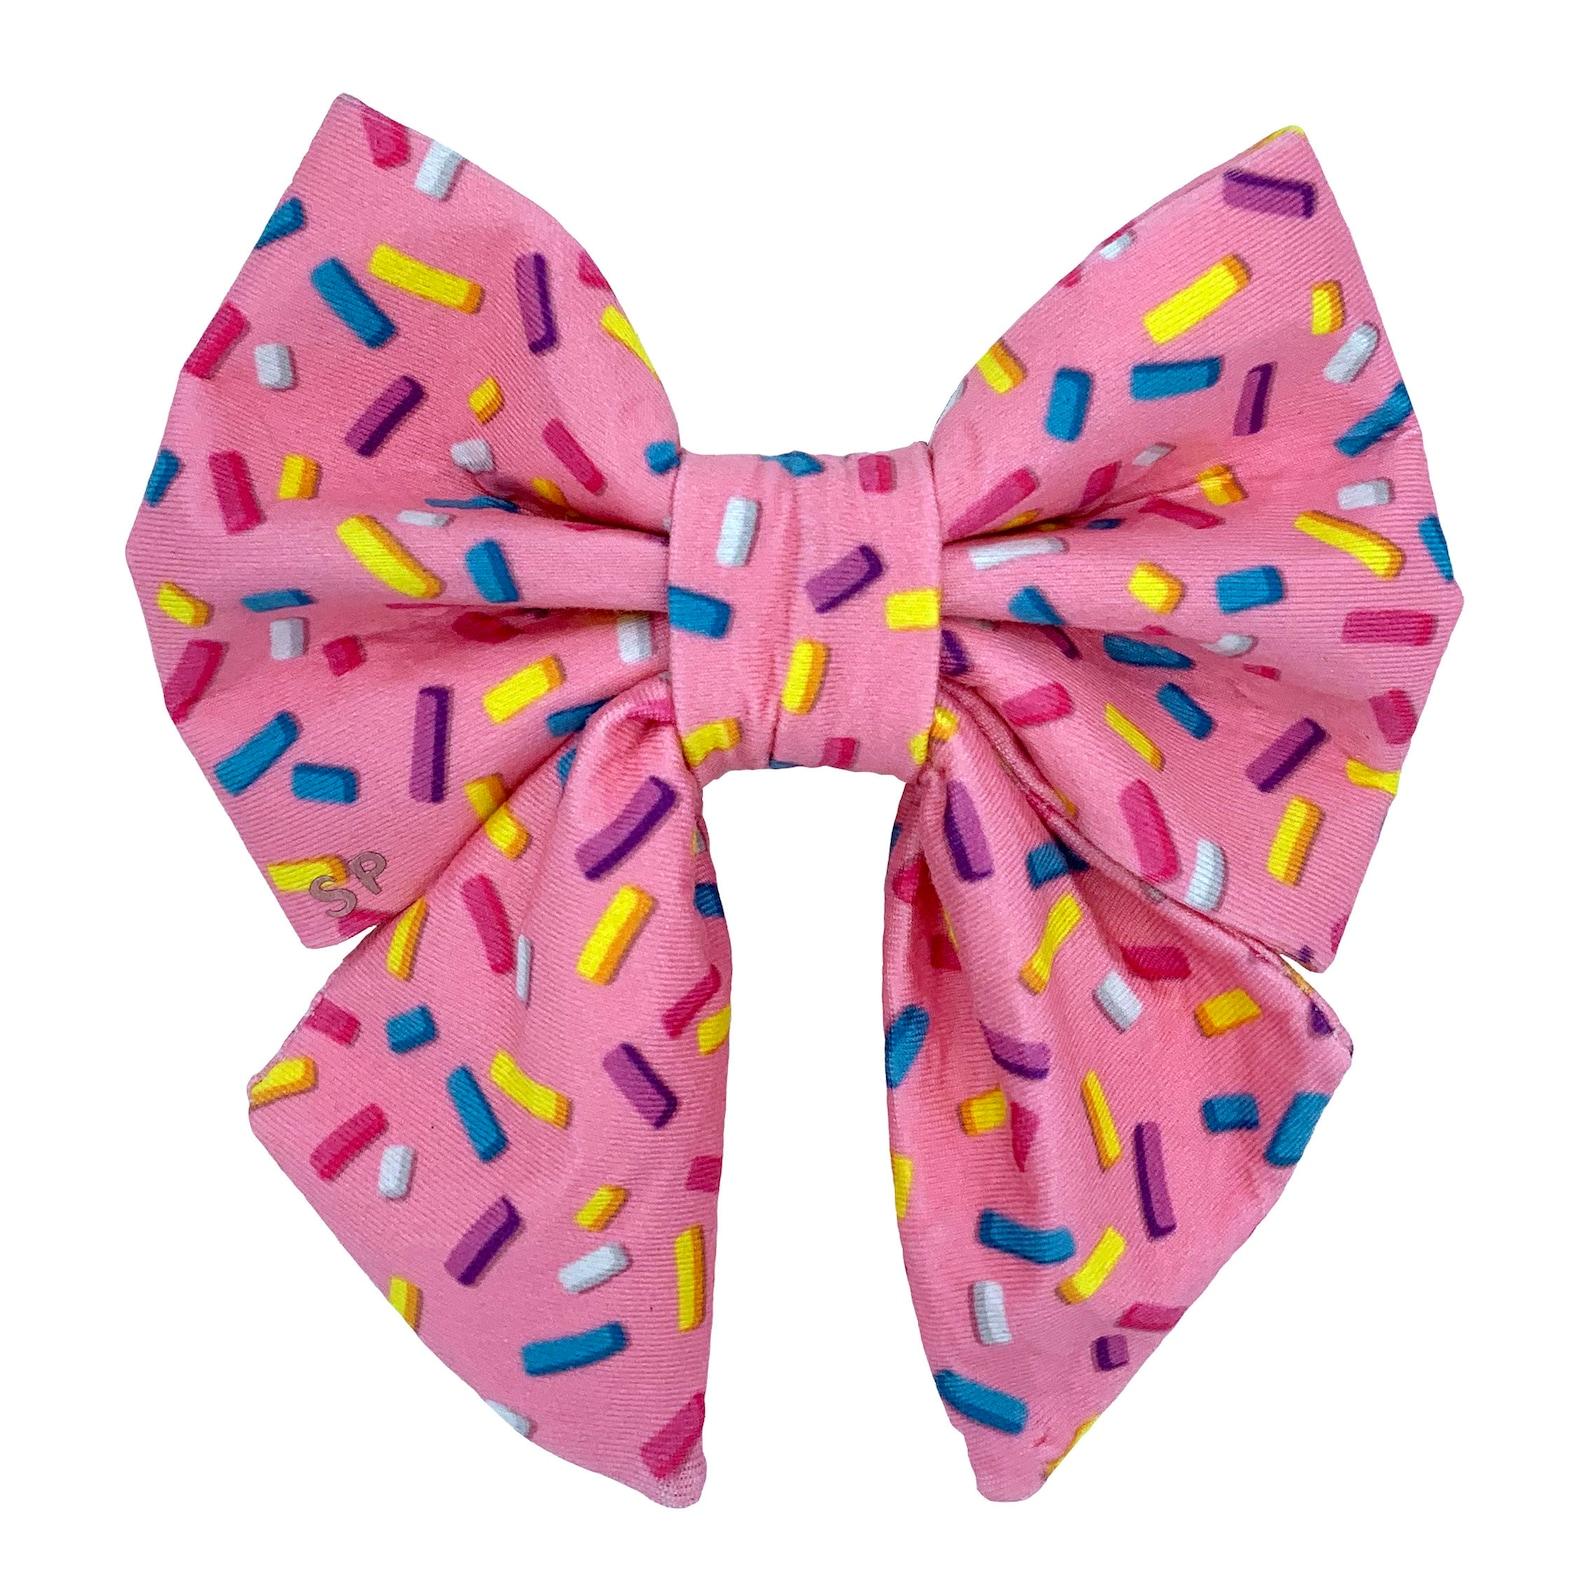 Dog bow tie in pink sprinkles design